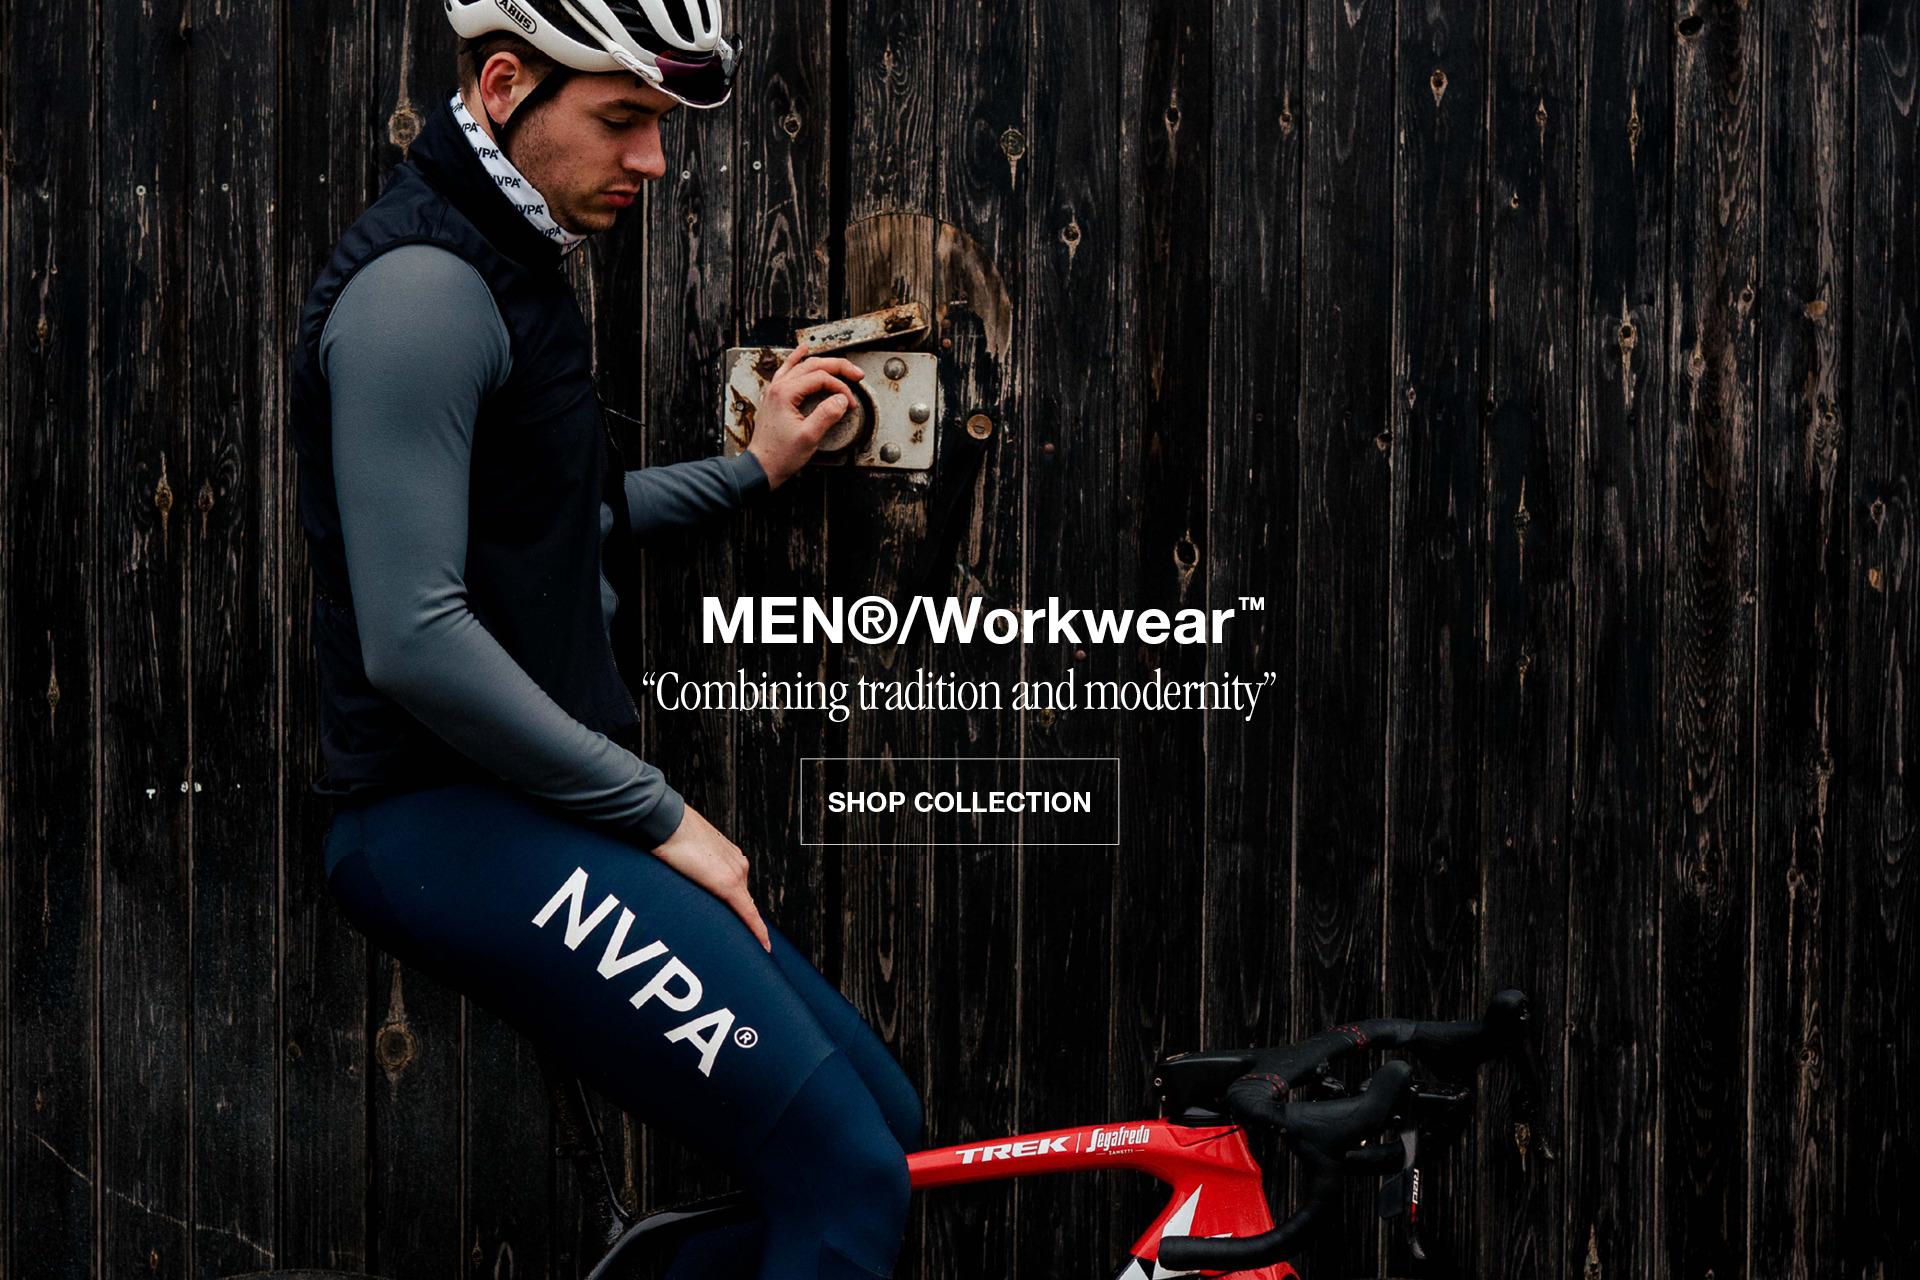 Men/Workwear